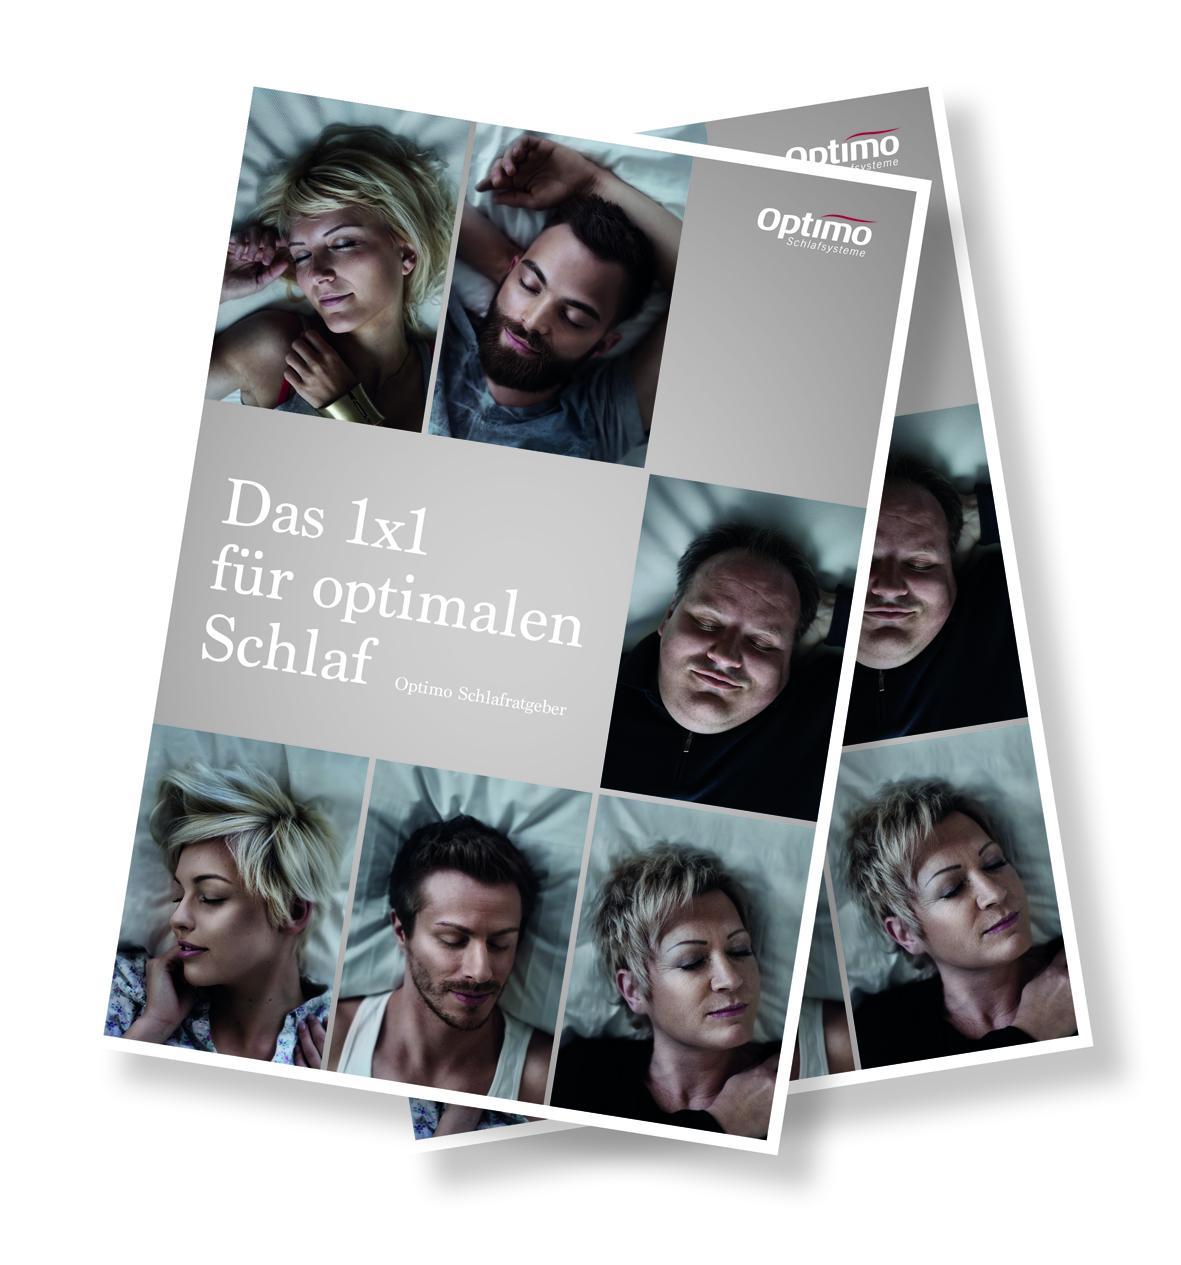 optimo_schlafratgeber_cover_02